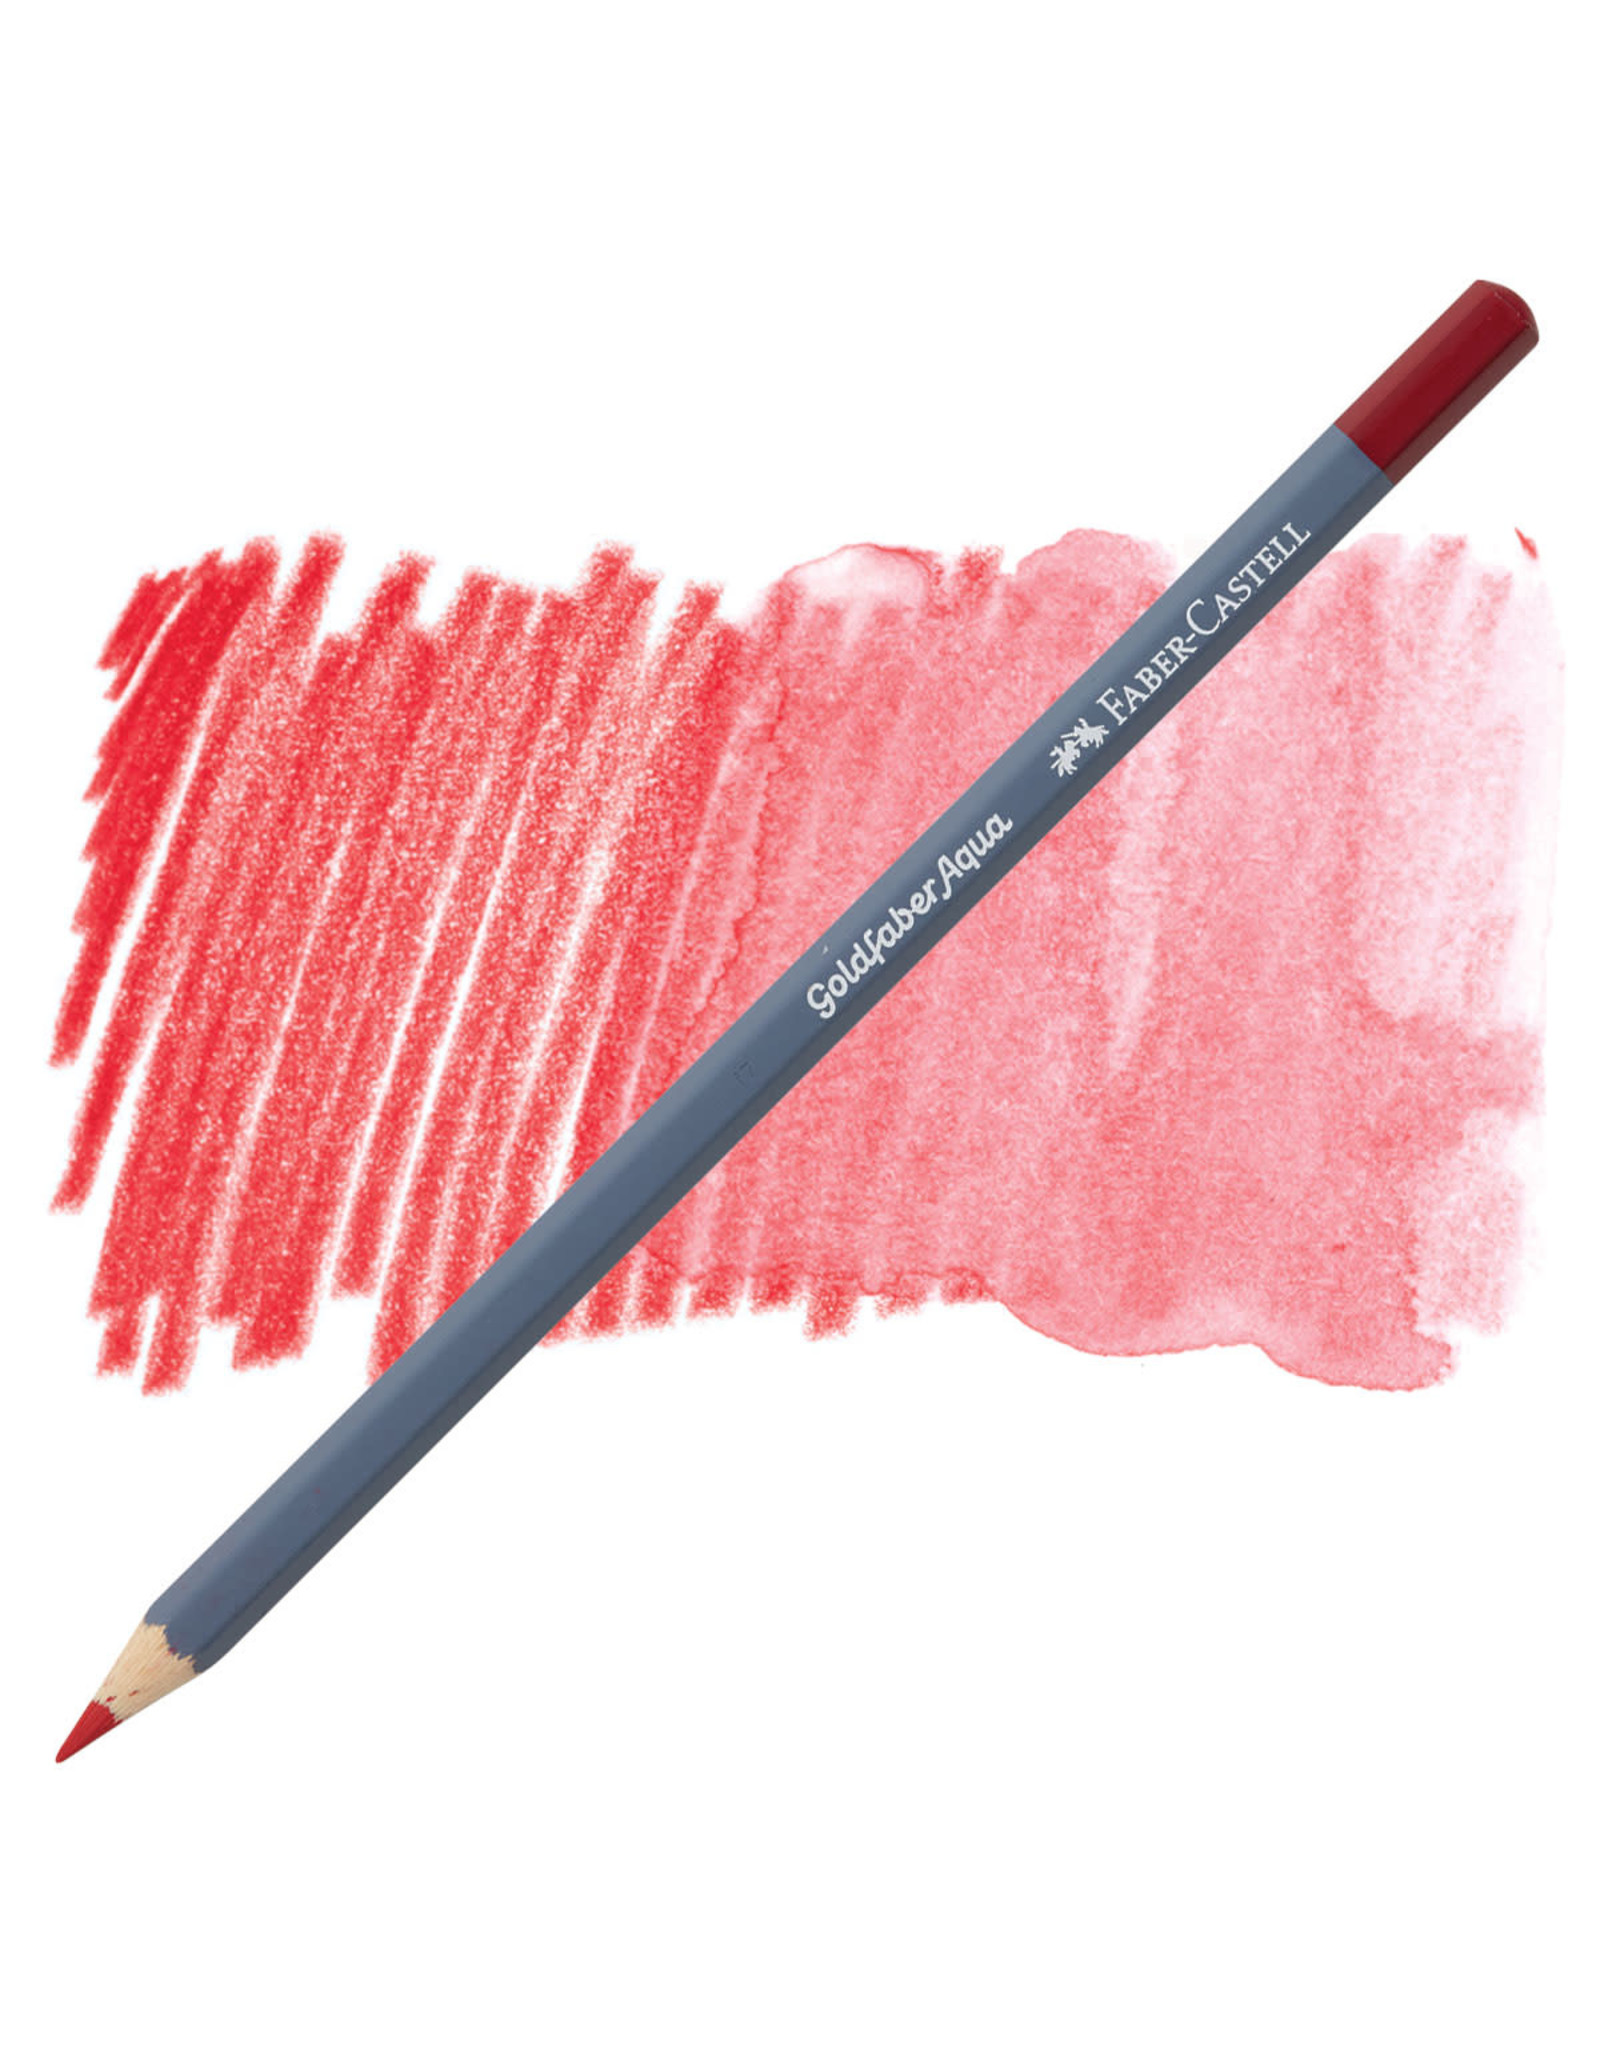 Faber-Castell Goldfaber Aqua Watercolor Pencil - Permanent Carmine #126